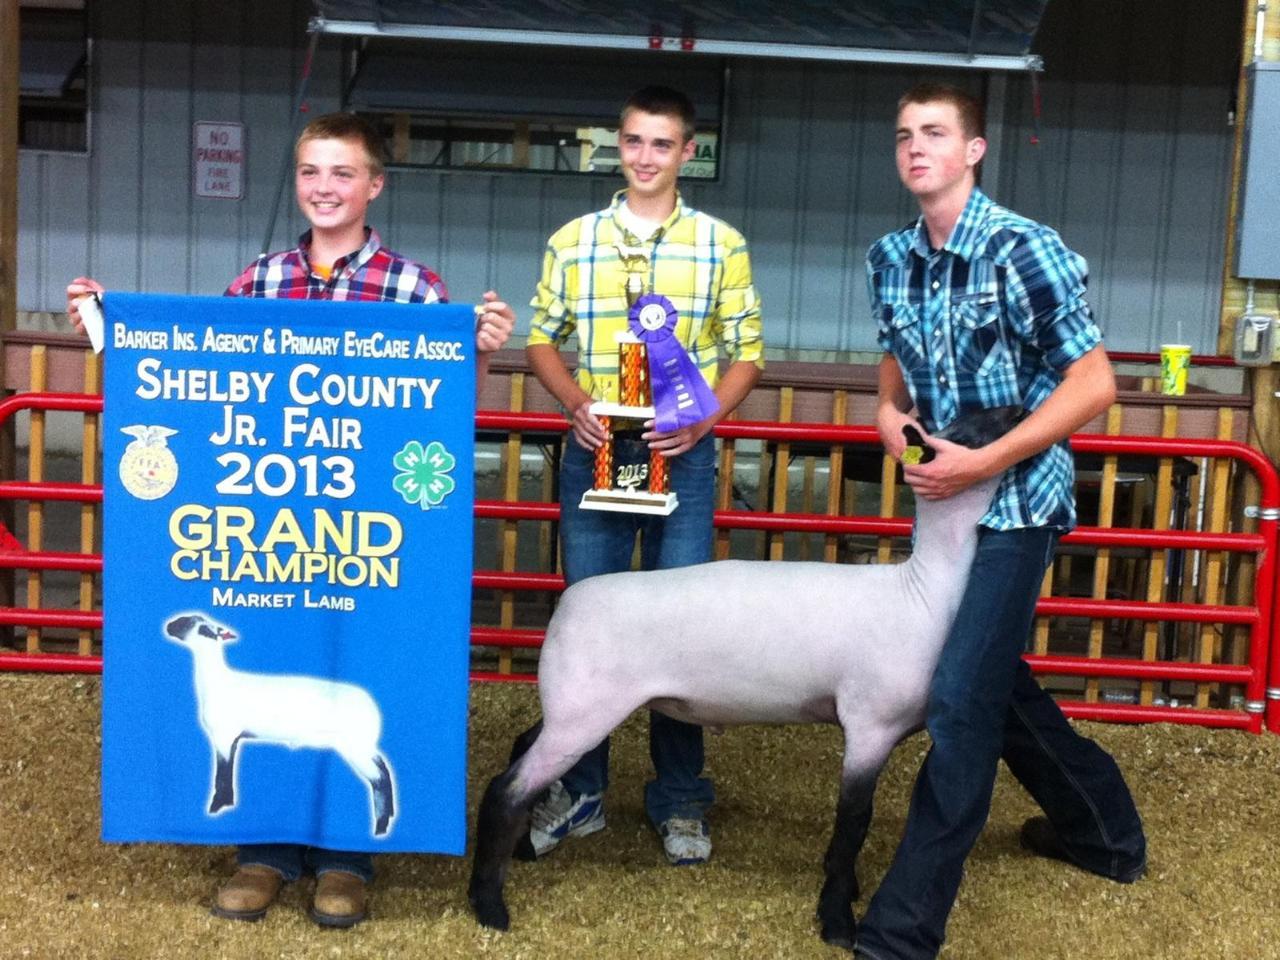 Grand Champion - @ Shelby County Fair 2013